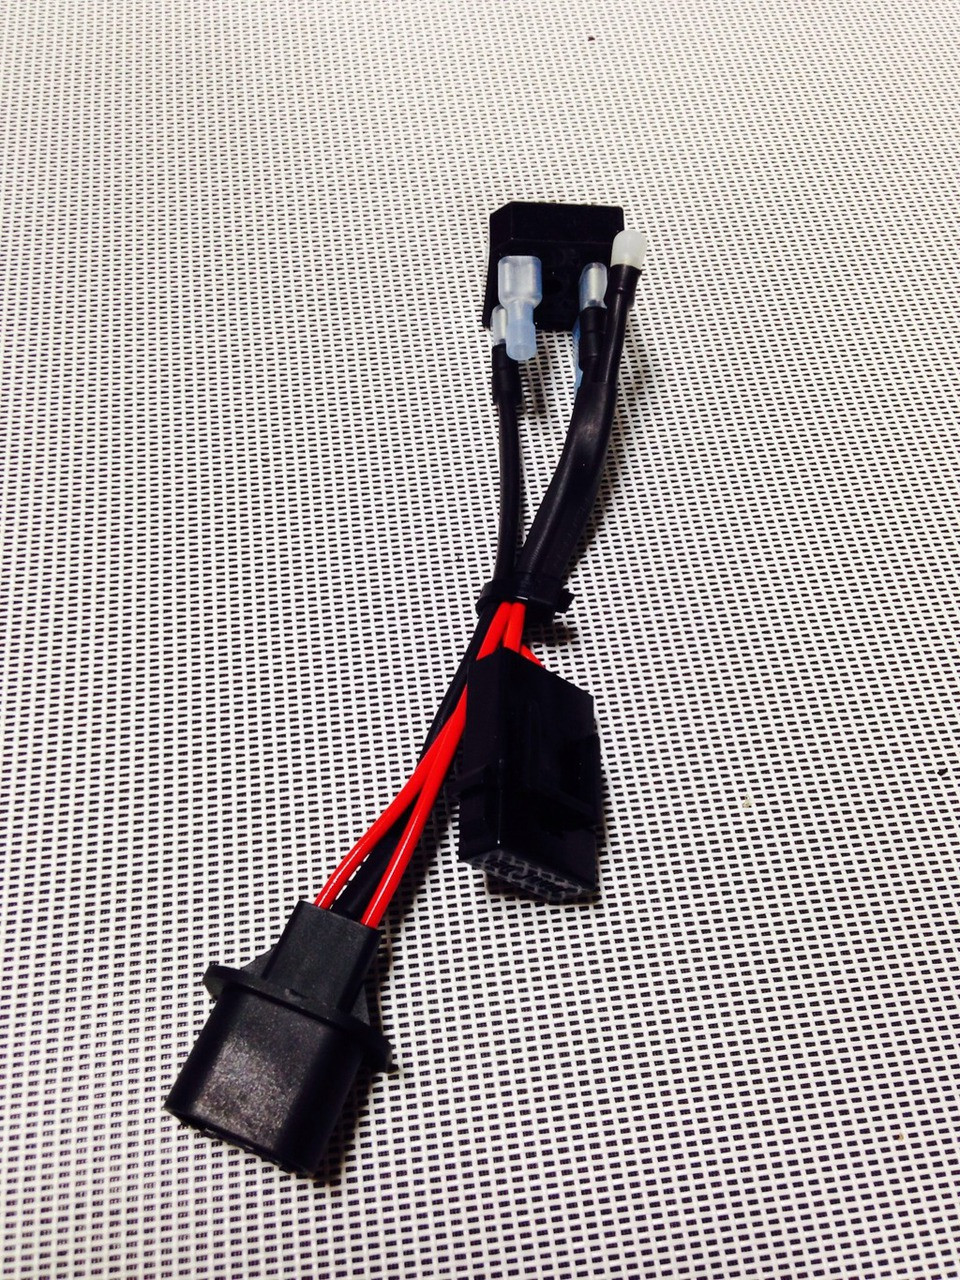 hight resolution of polaris proride plug n play led wiring harness mountain fit hoods polaris general wiring harness polaris wiring harness